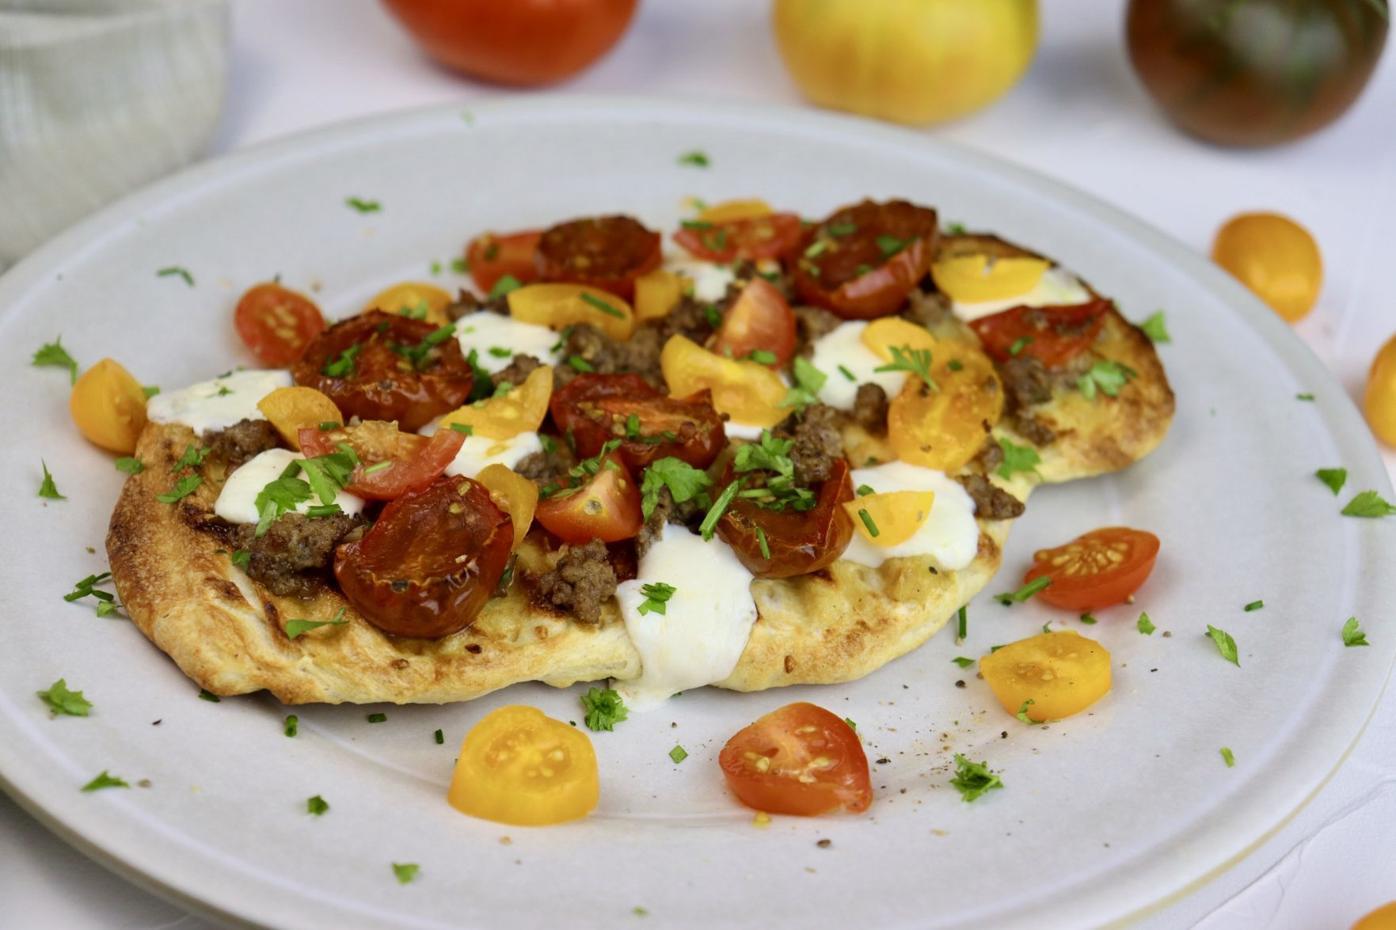 Tomato, Ground Beef and Mozzarella Flatbread